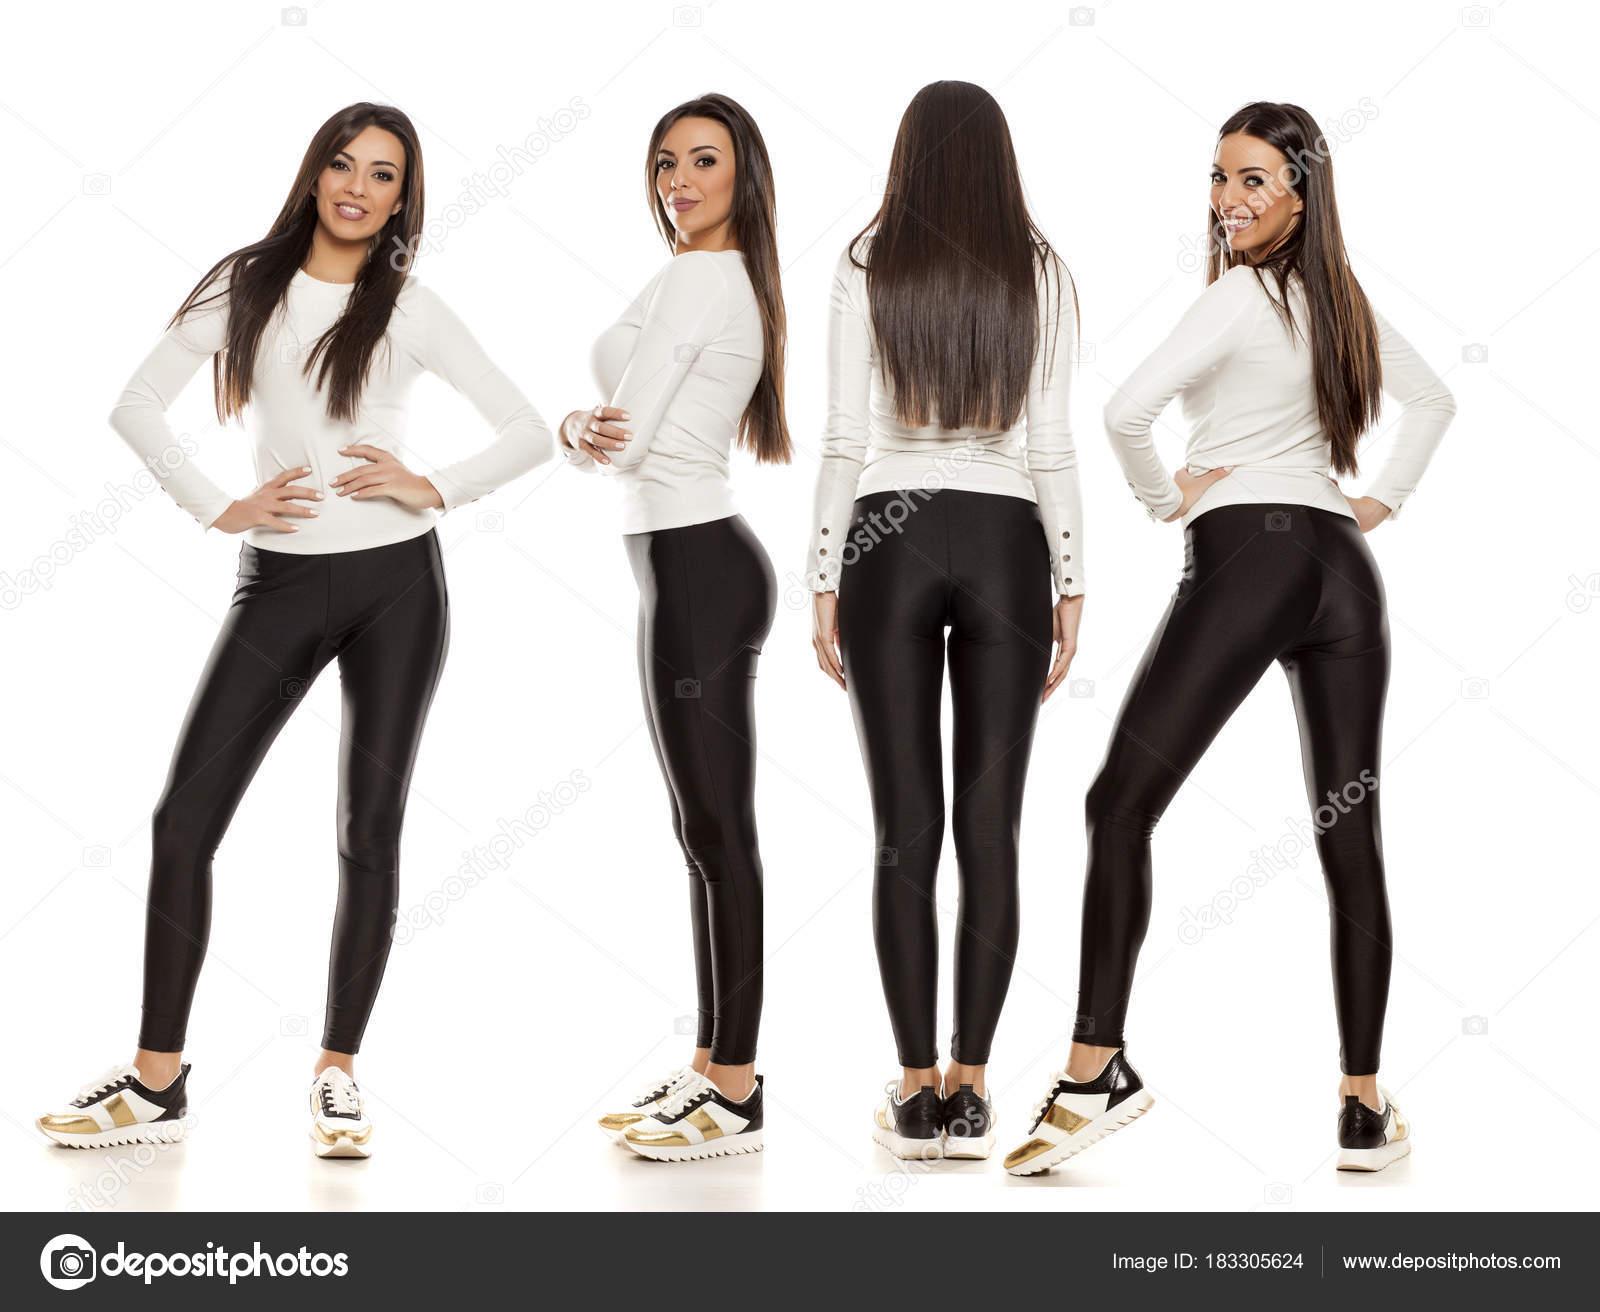 907b7155dad8 Κολάζ Μια Νεαρή Όμορφη Γυναίκα Στο Μαύρο Κολάν Λευκή Μπλούζα ...